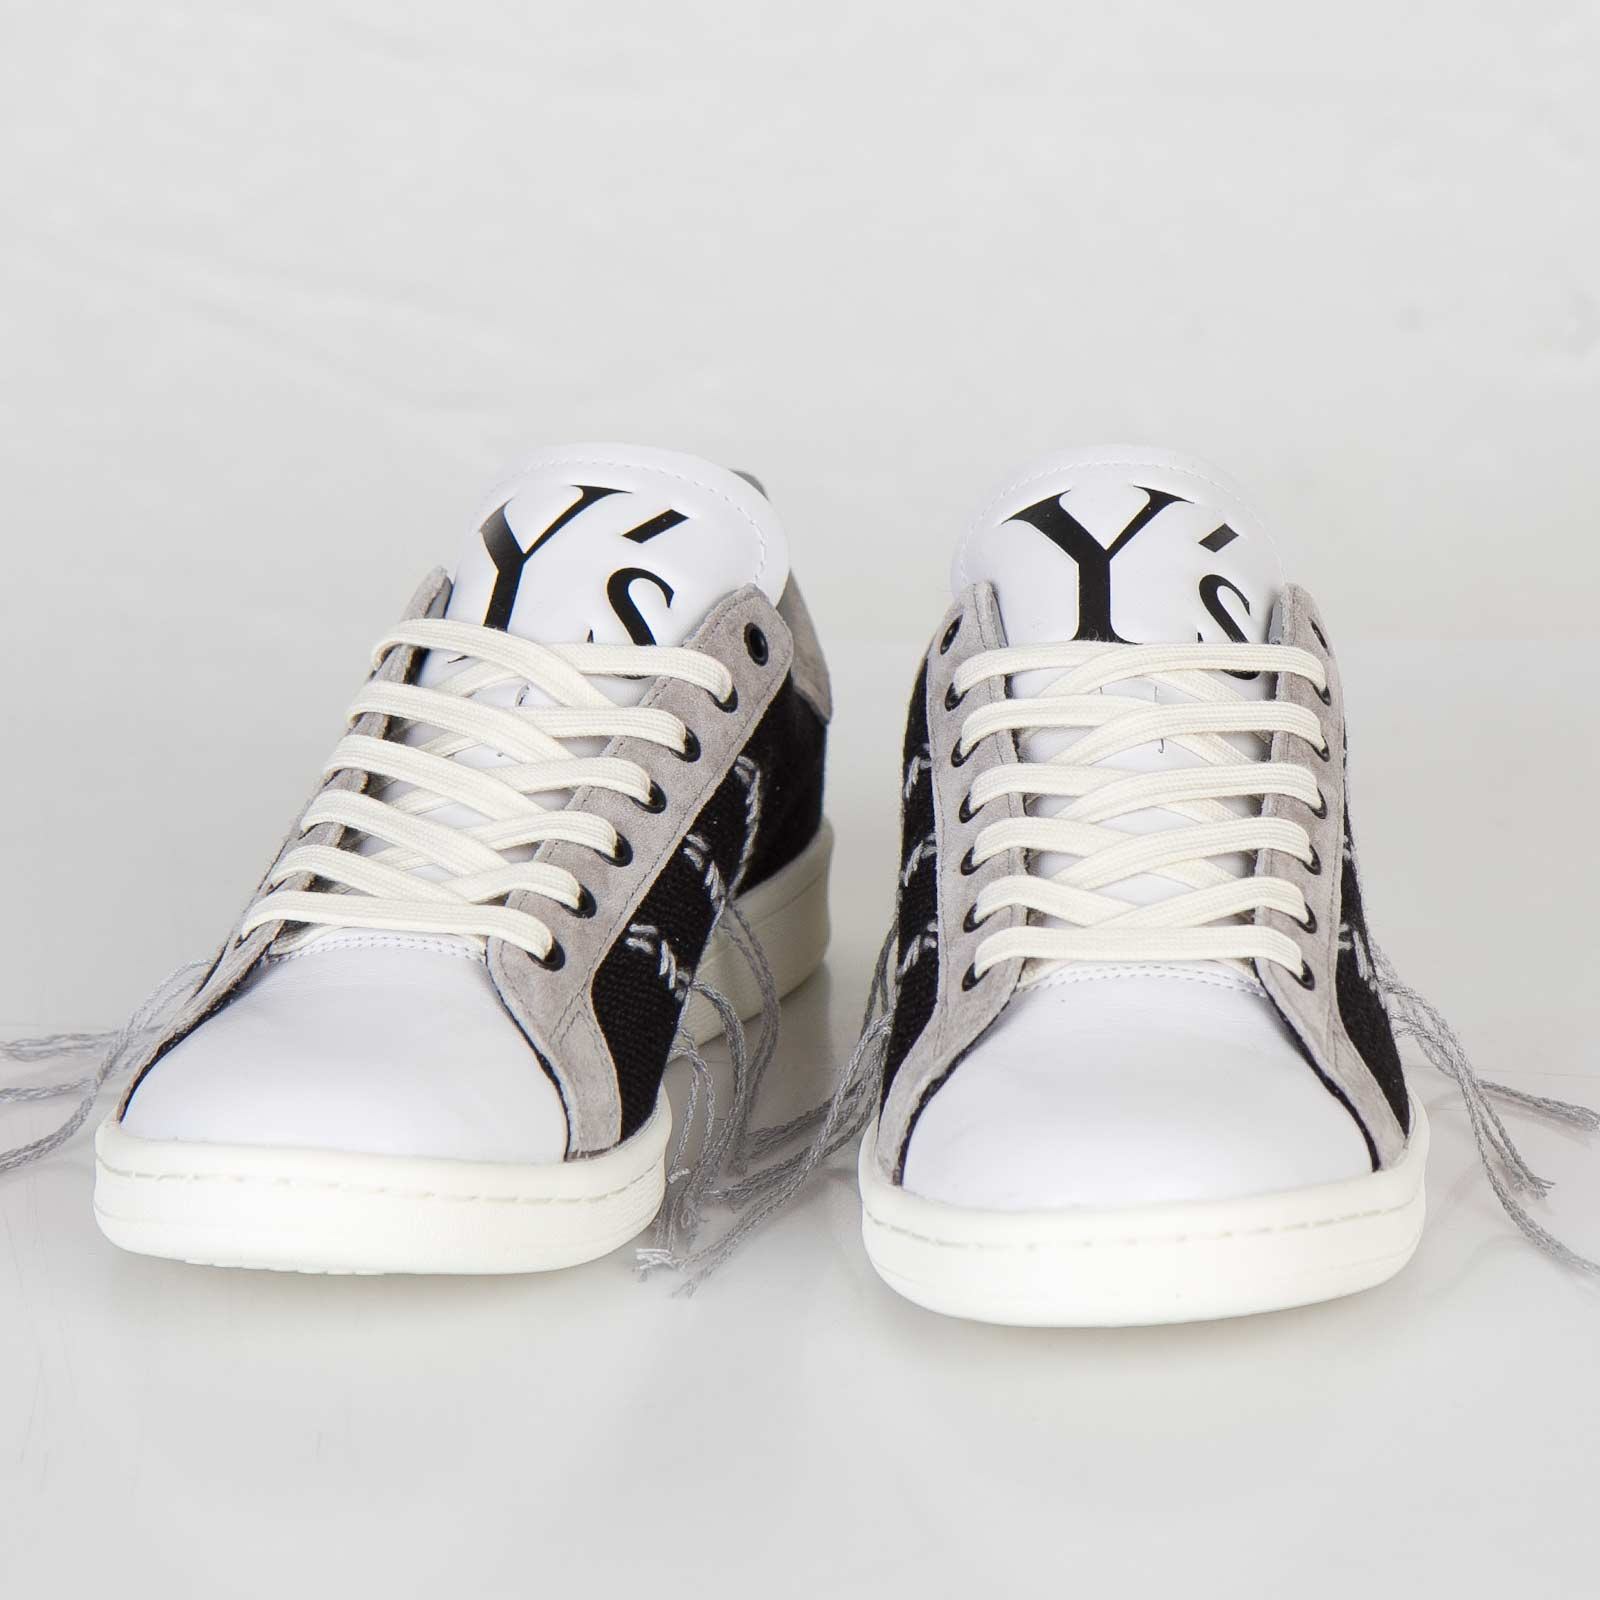 adidas Stan Smith YS M22700 Sneakersnstuff | sneakers